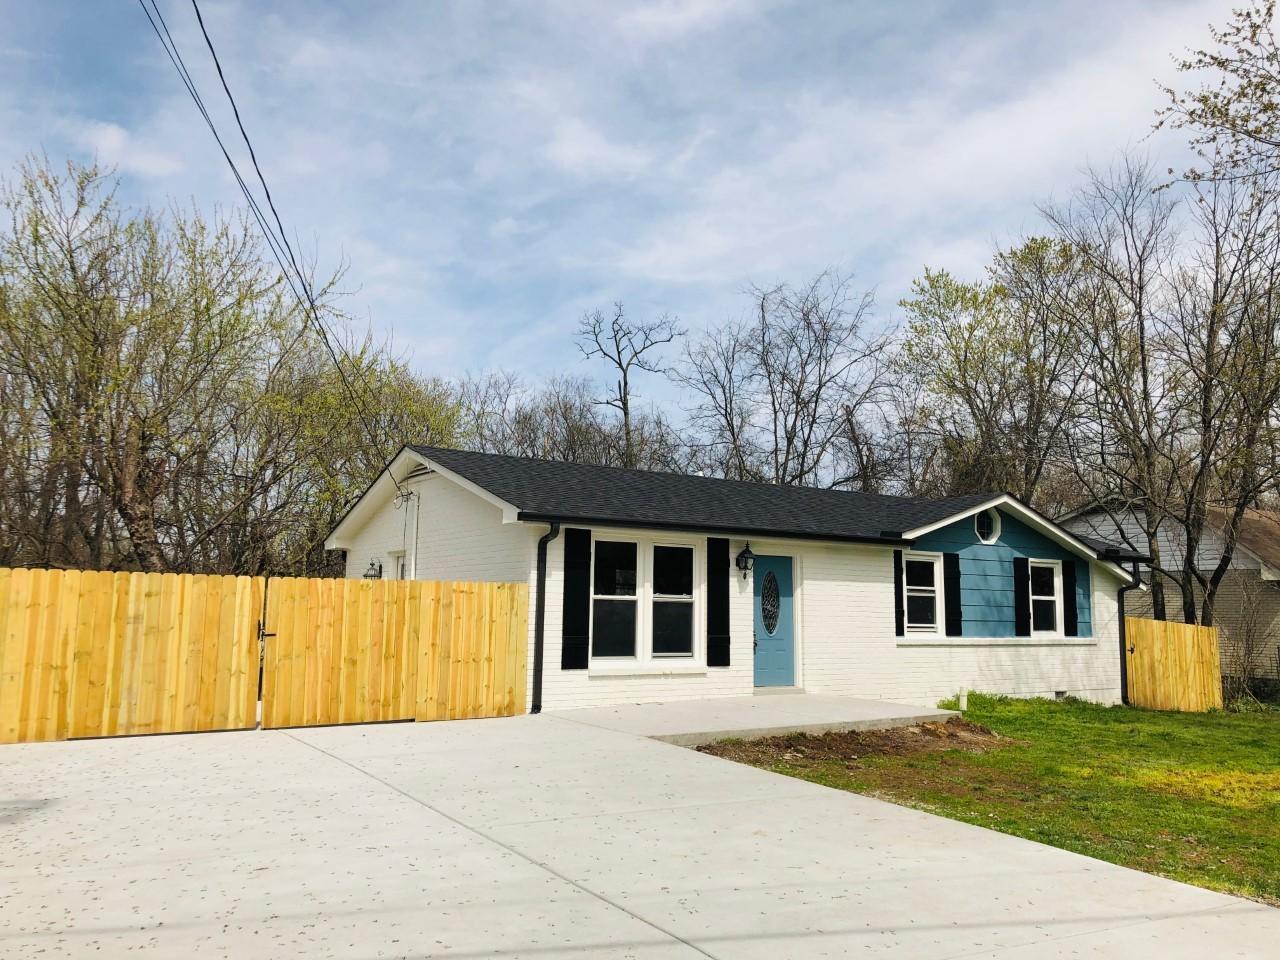 348 Bart Dr, Antioch, TN 37013 - Antioch, TN real estate listing